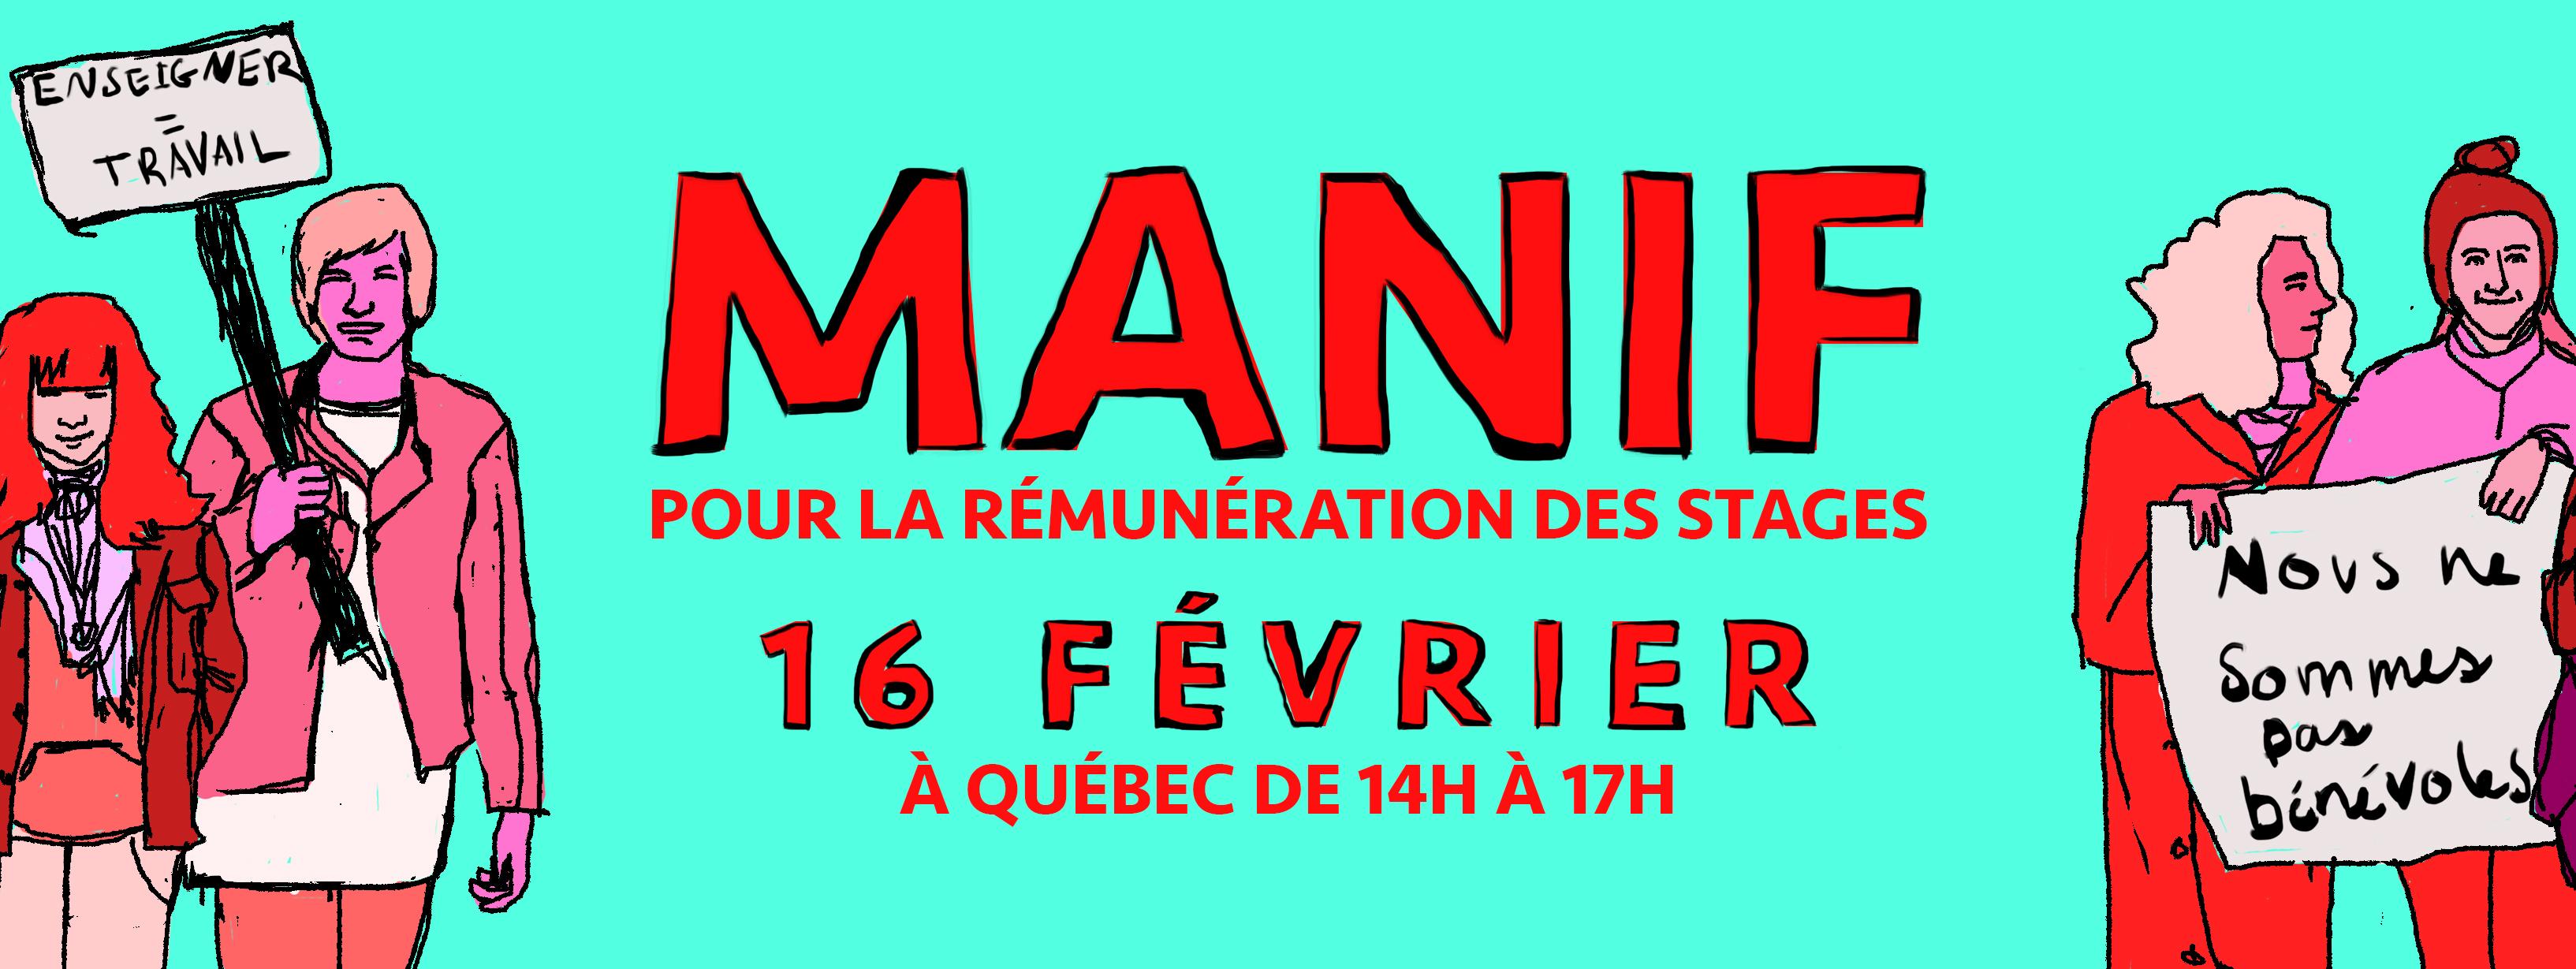 MANIF 16 fev